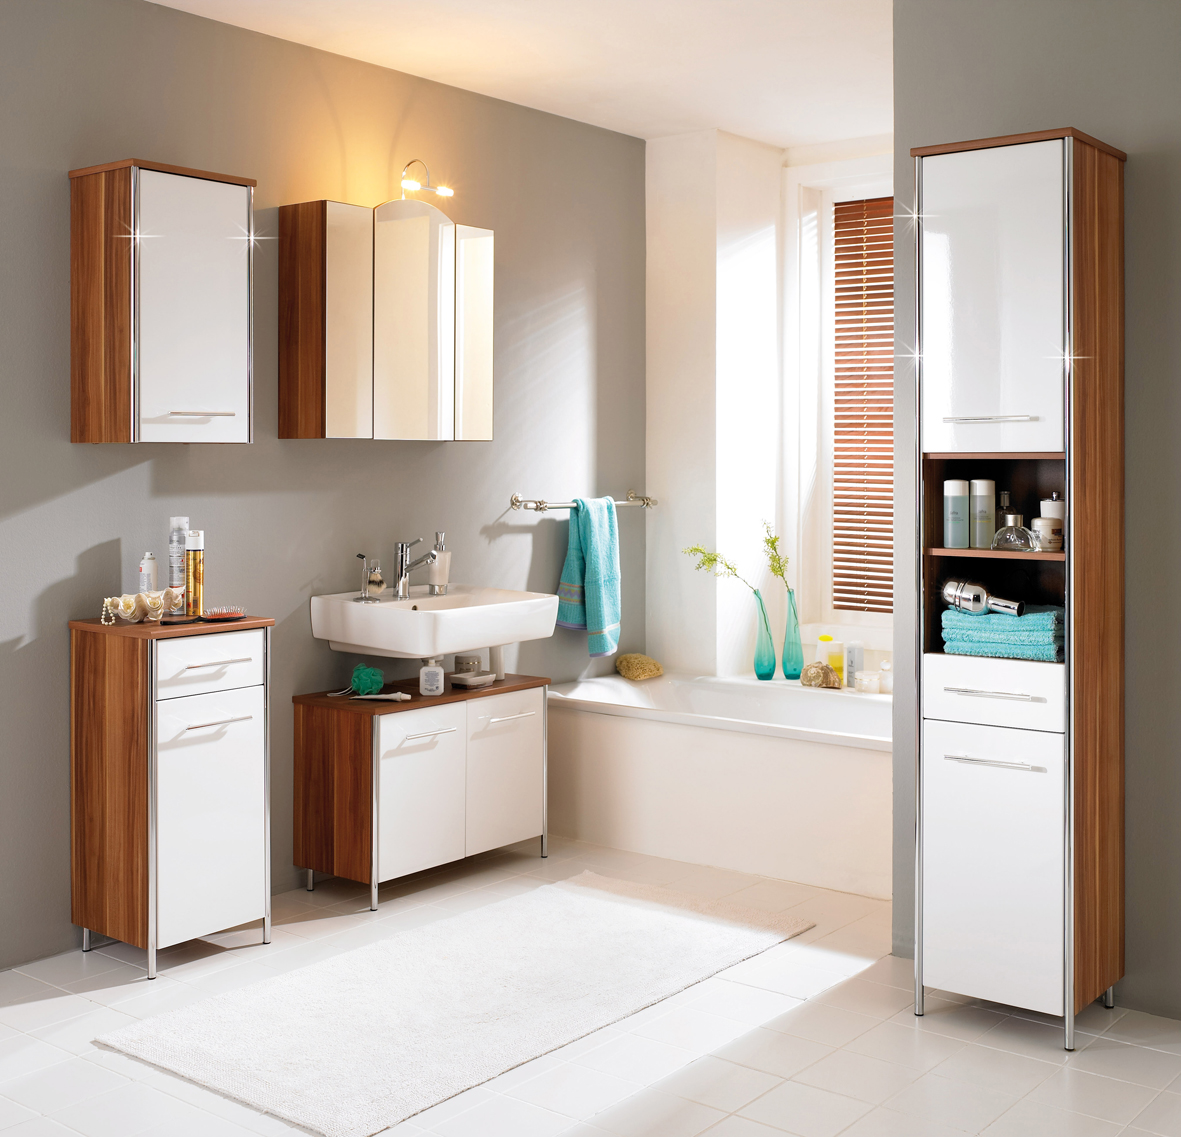 Retro Small Bathroom Ideas With Stunning Decoration (Image 12 of 20)